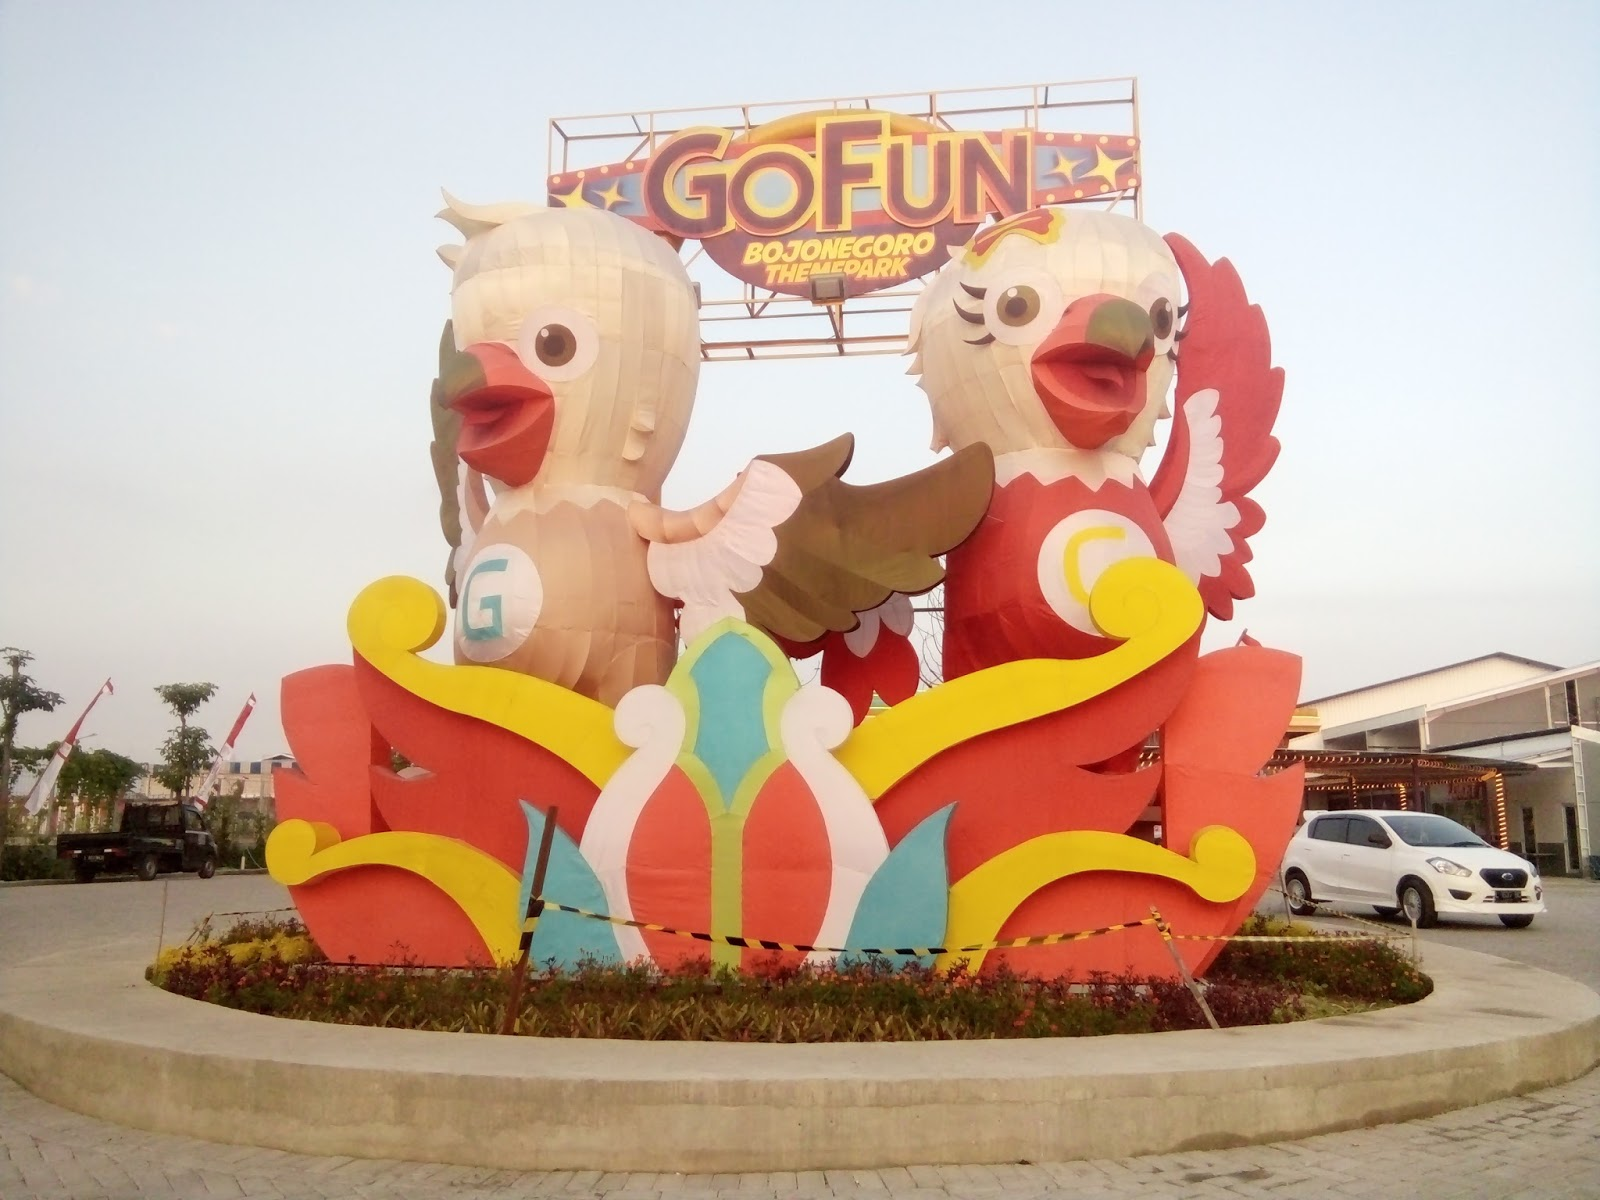 Jalan Gofun Bojonegoro Theme Park Destinasi Wisata Wahana Maskot Fun